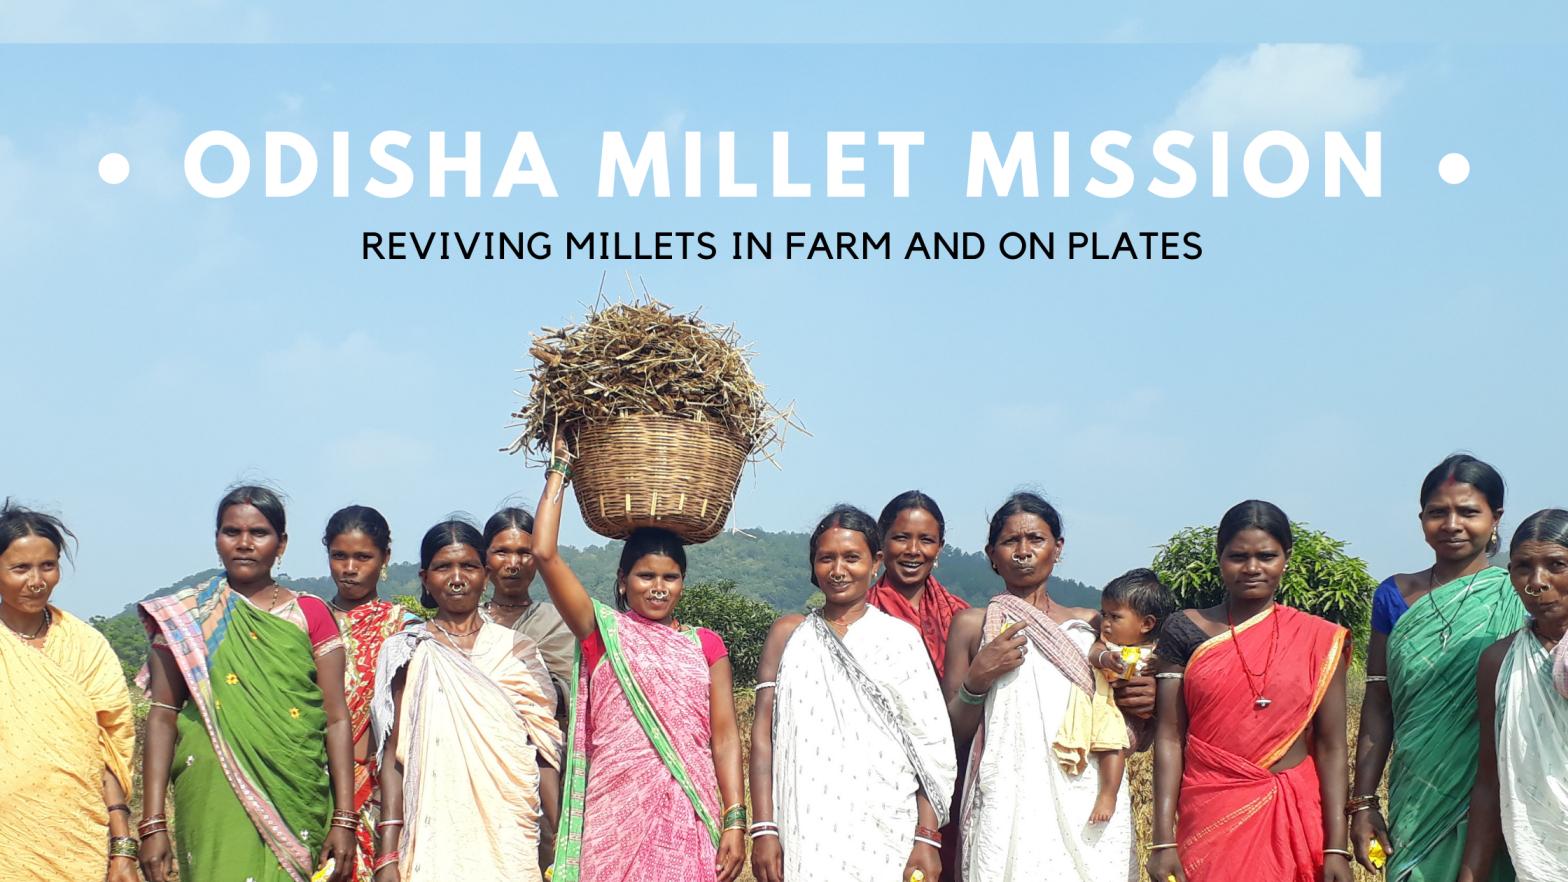 Odisha Millet Mission